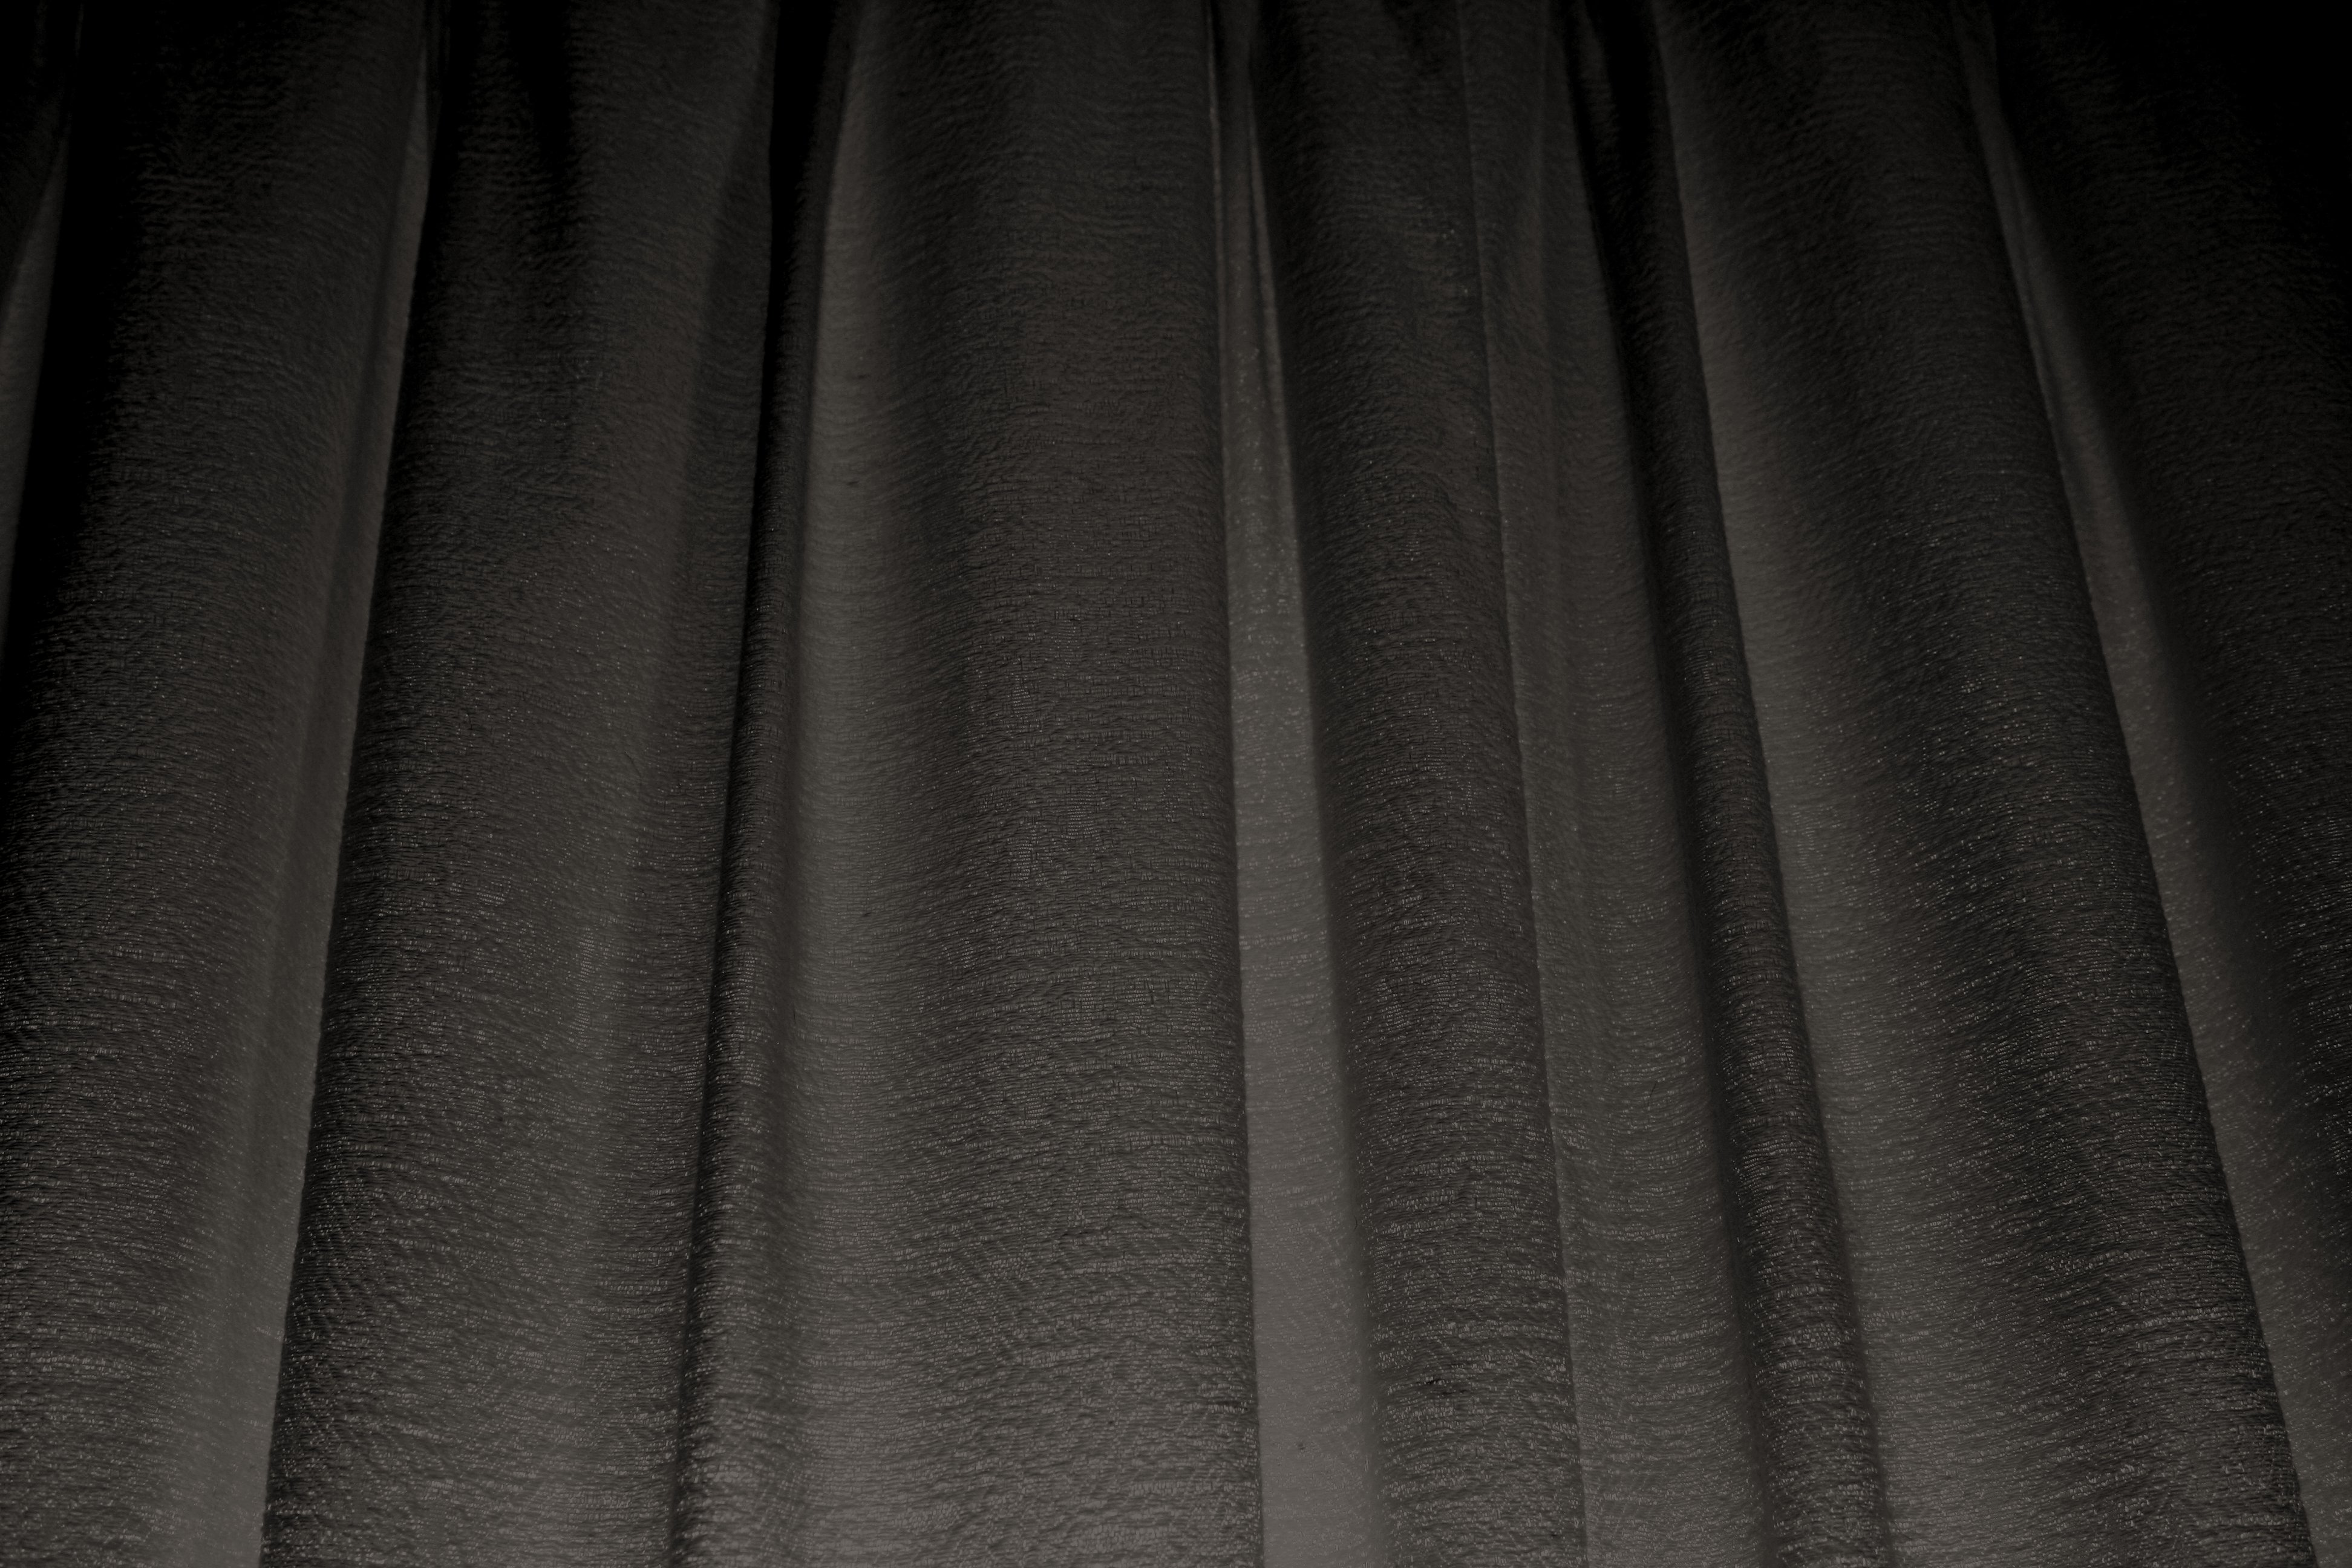 Black Curtain Texture window curtains texture